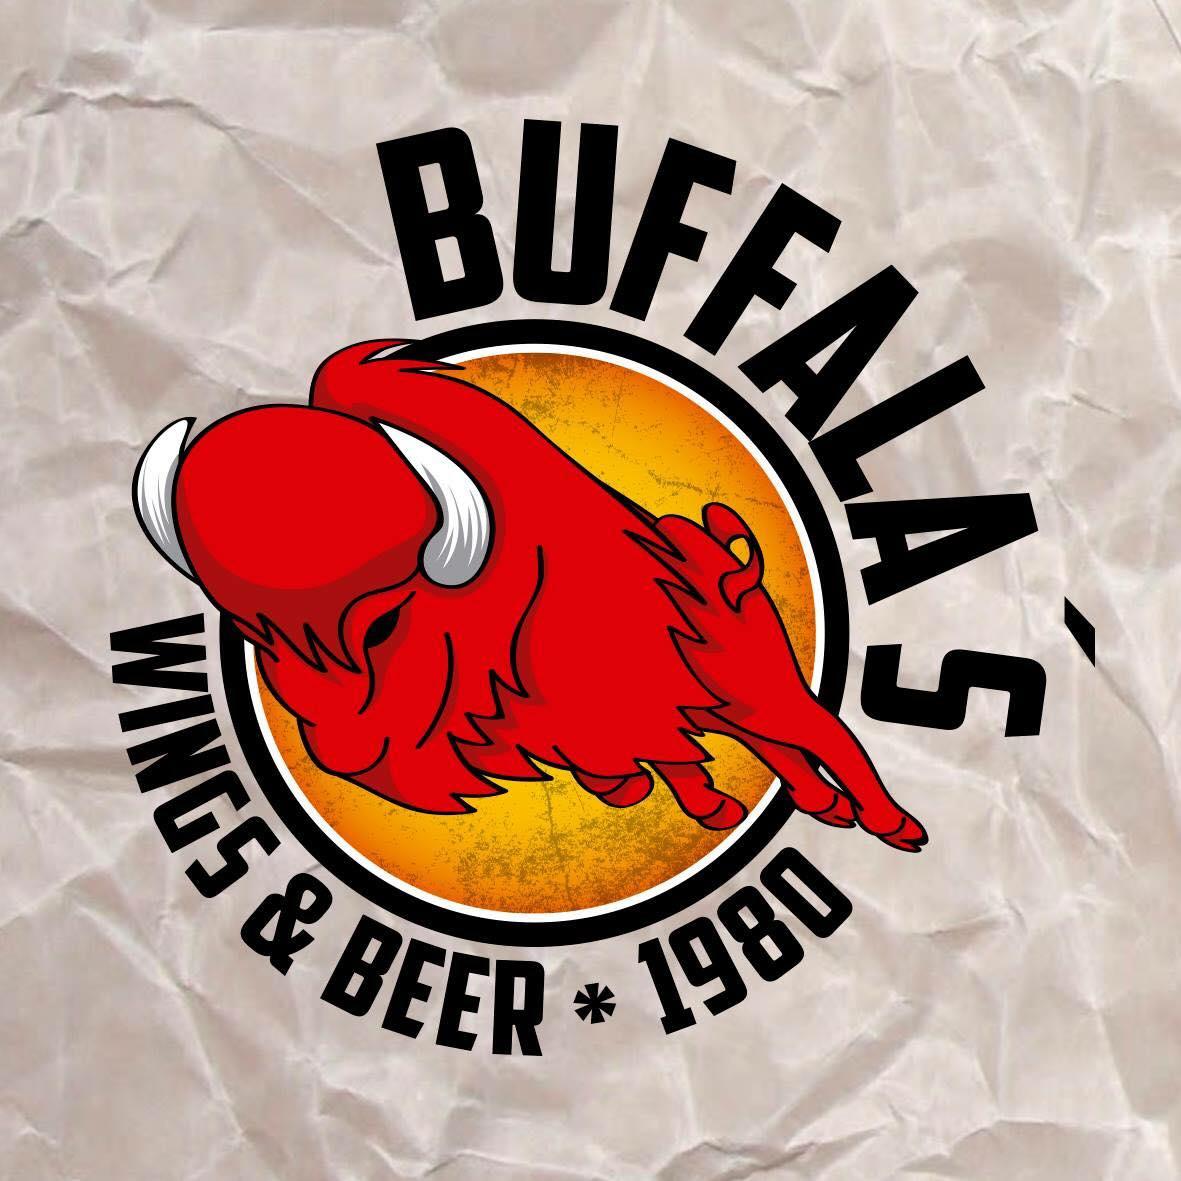 Buffala's